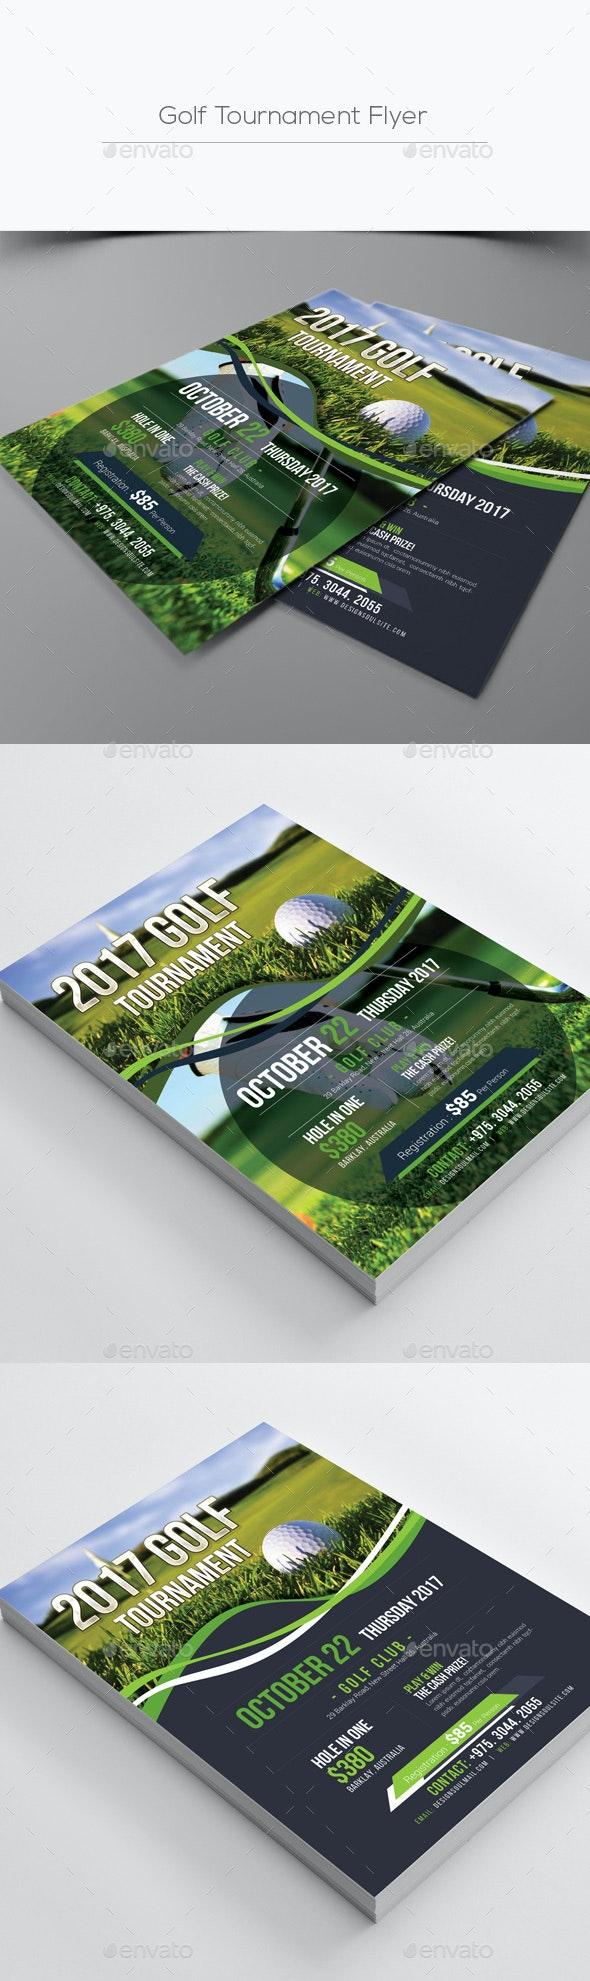 Golf Tournament Flyer - Corporate Flyers